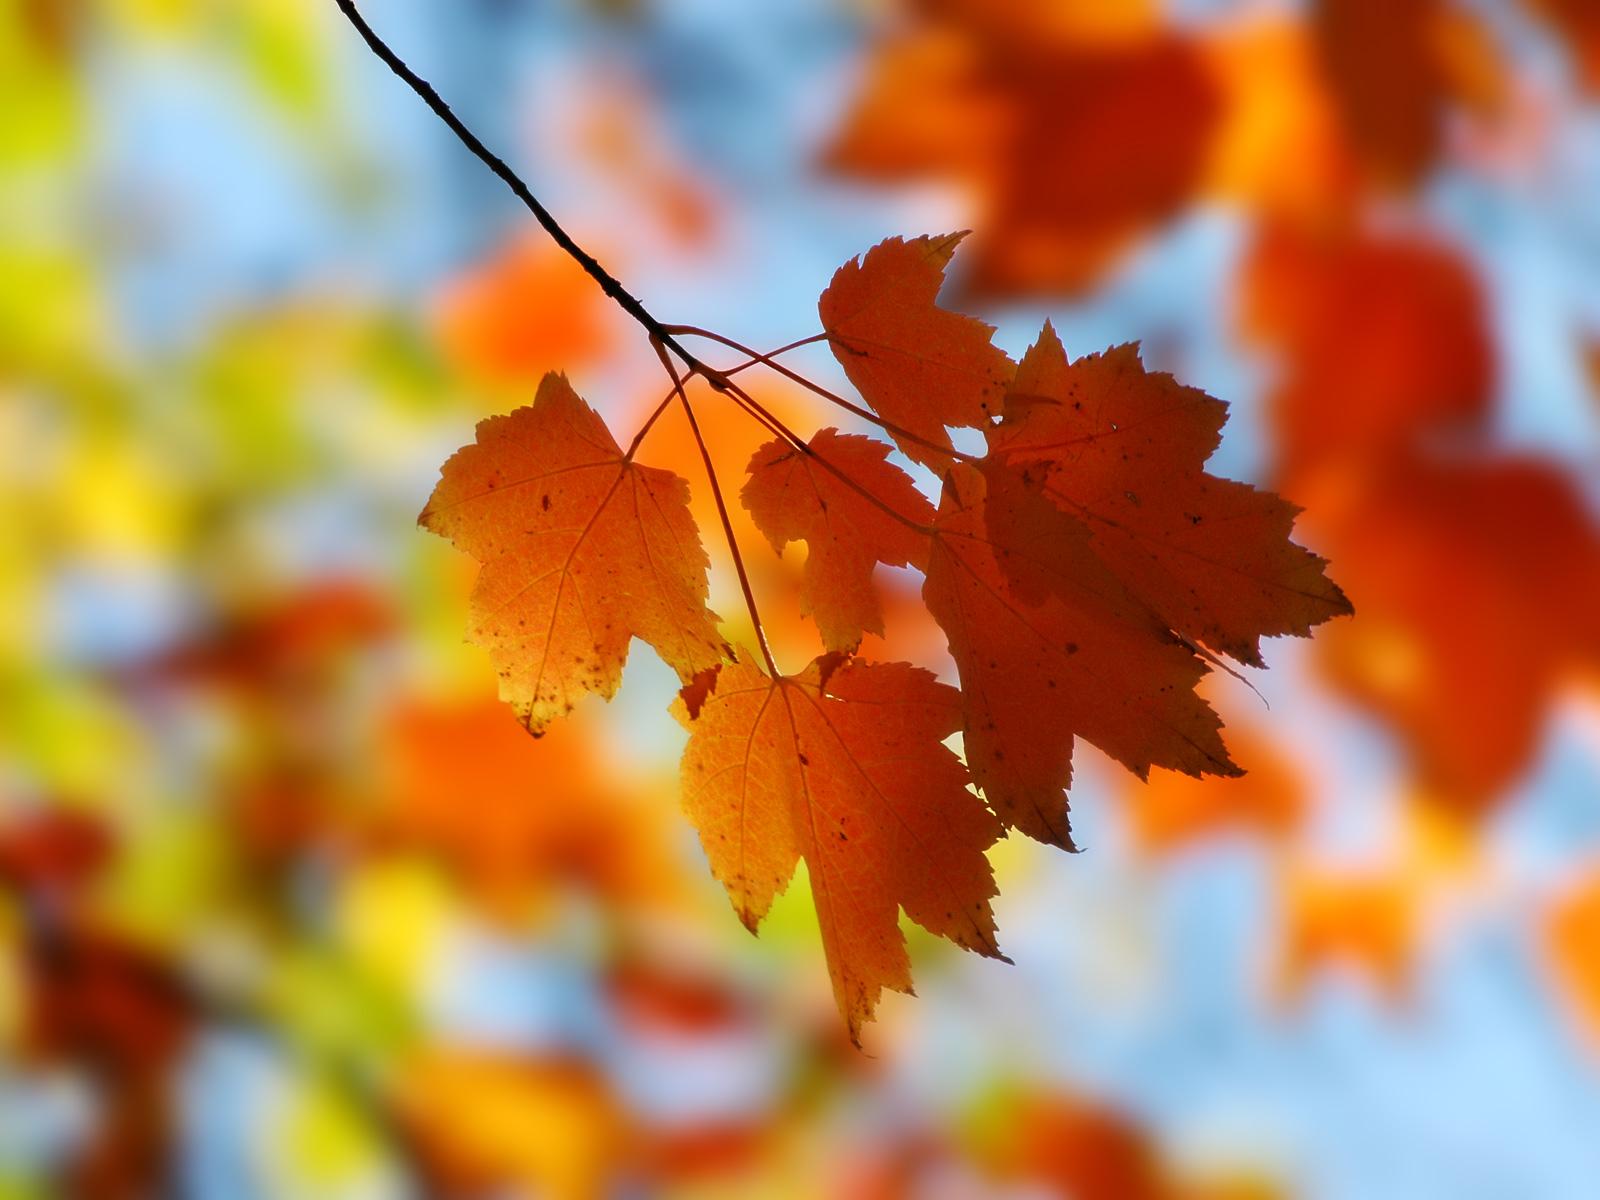 91rl48: Autumn Wallpaper Background